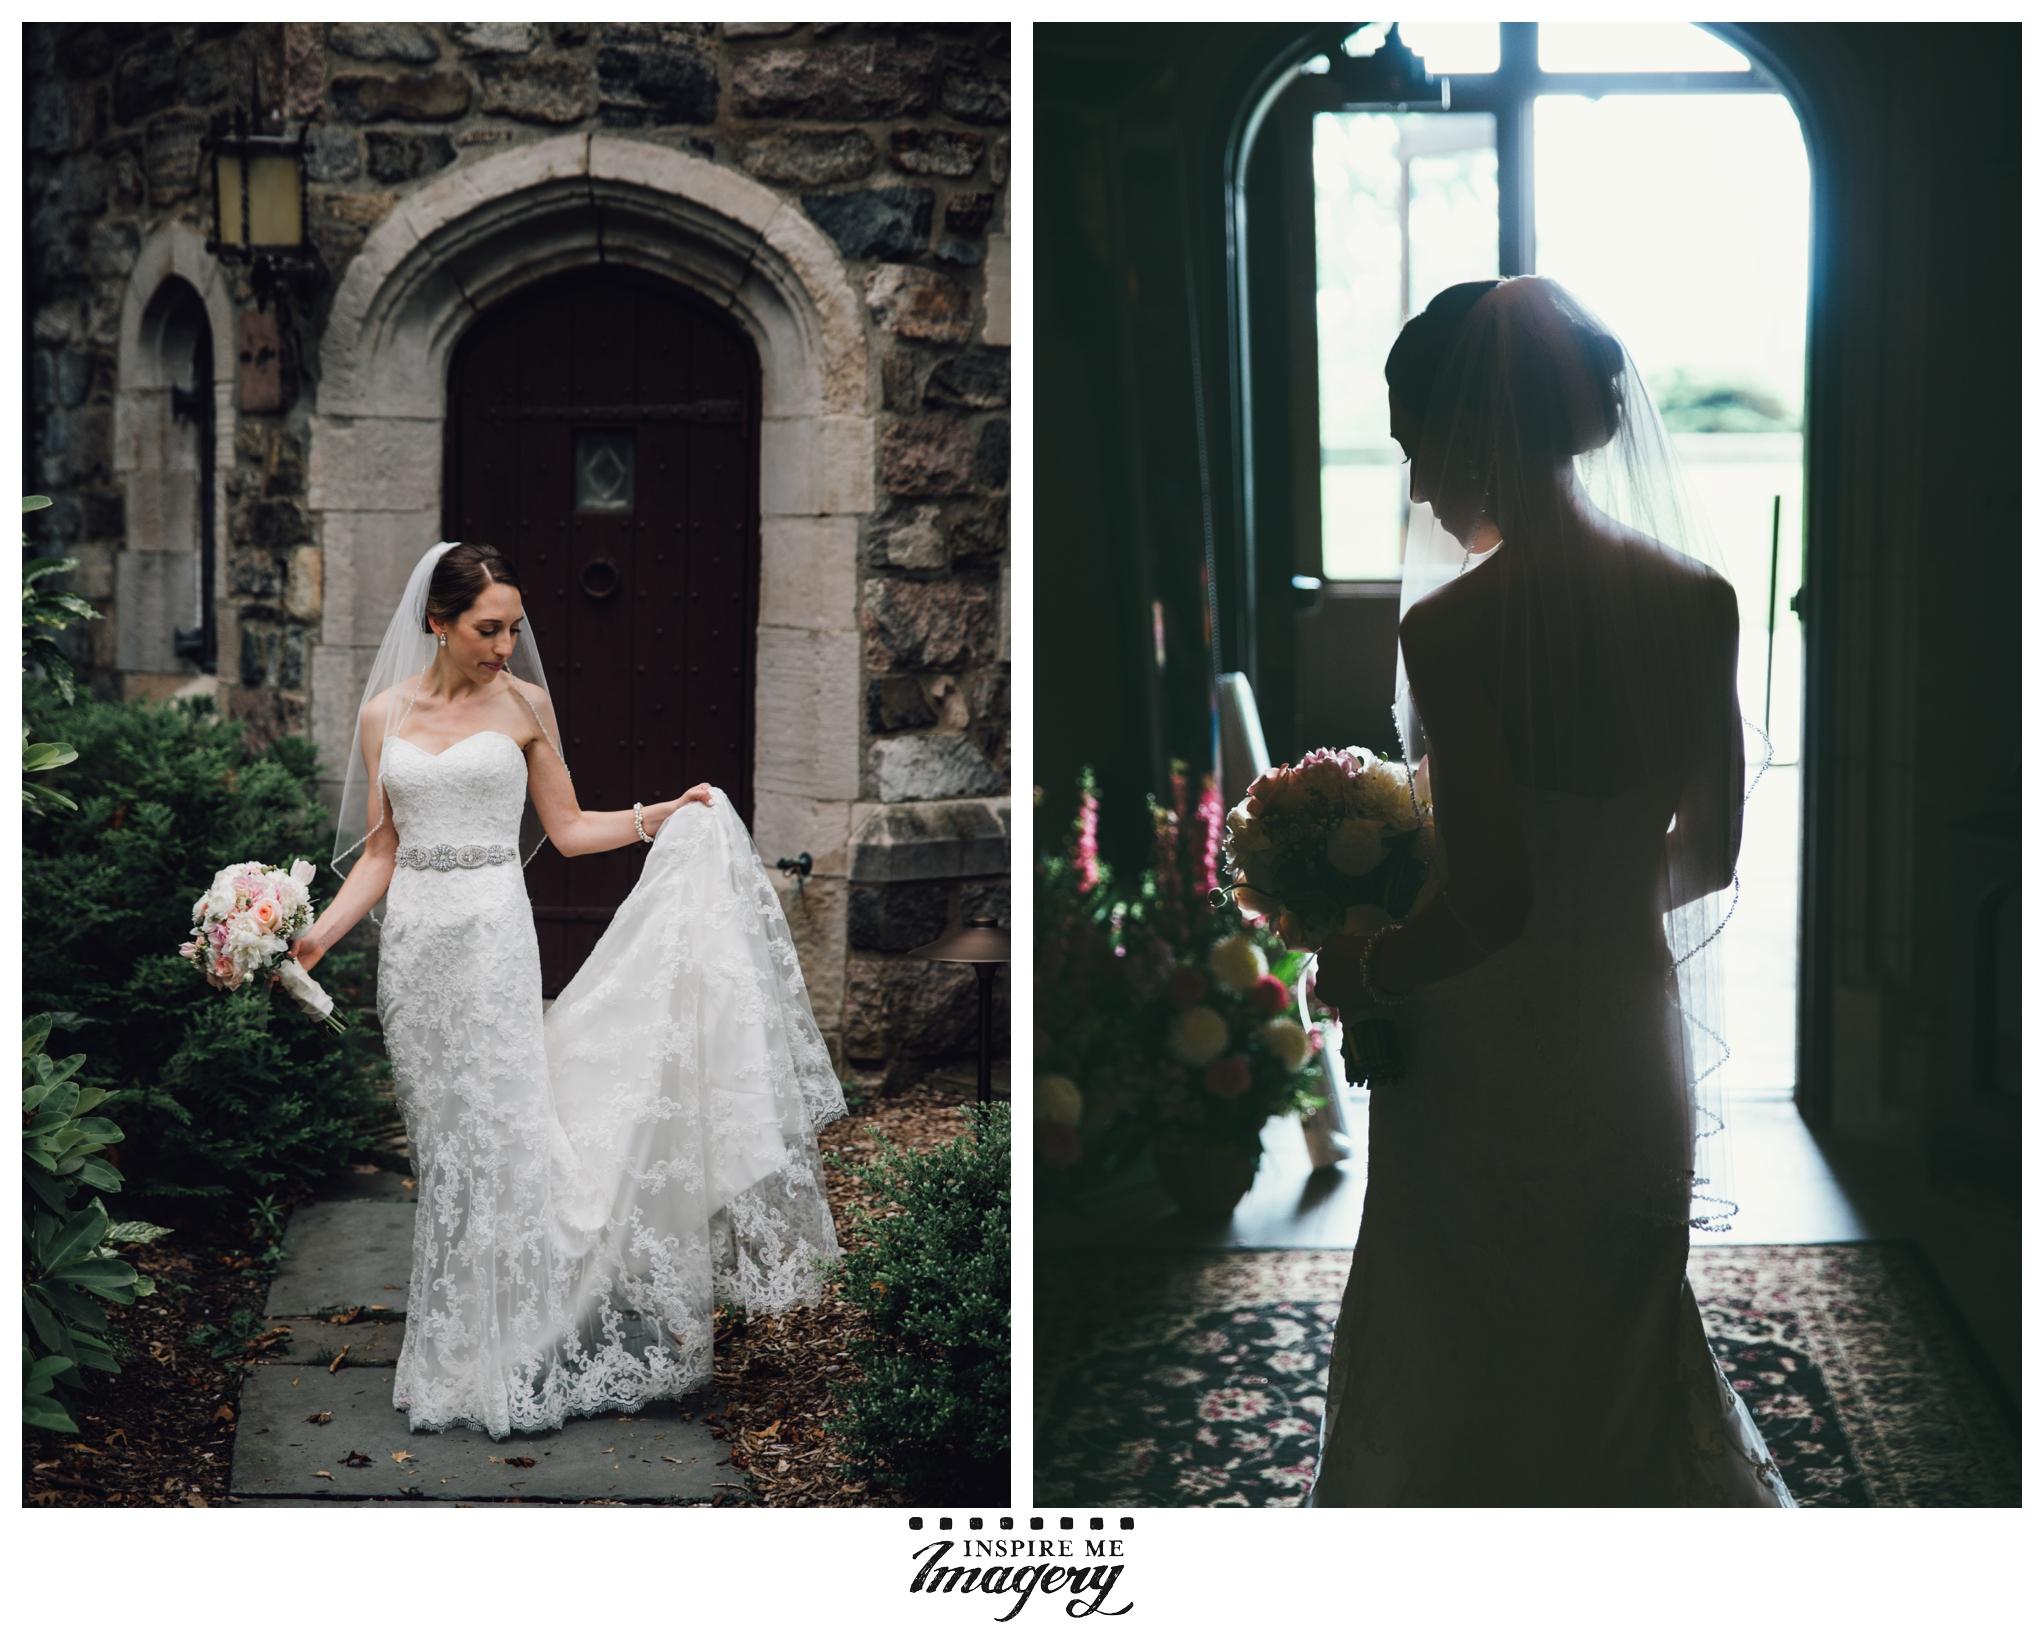 Wedding photos taken at  Skylands Manor / 5 Morris Rd, Ringwood, NJ 07456